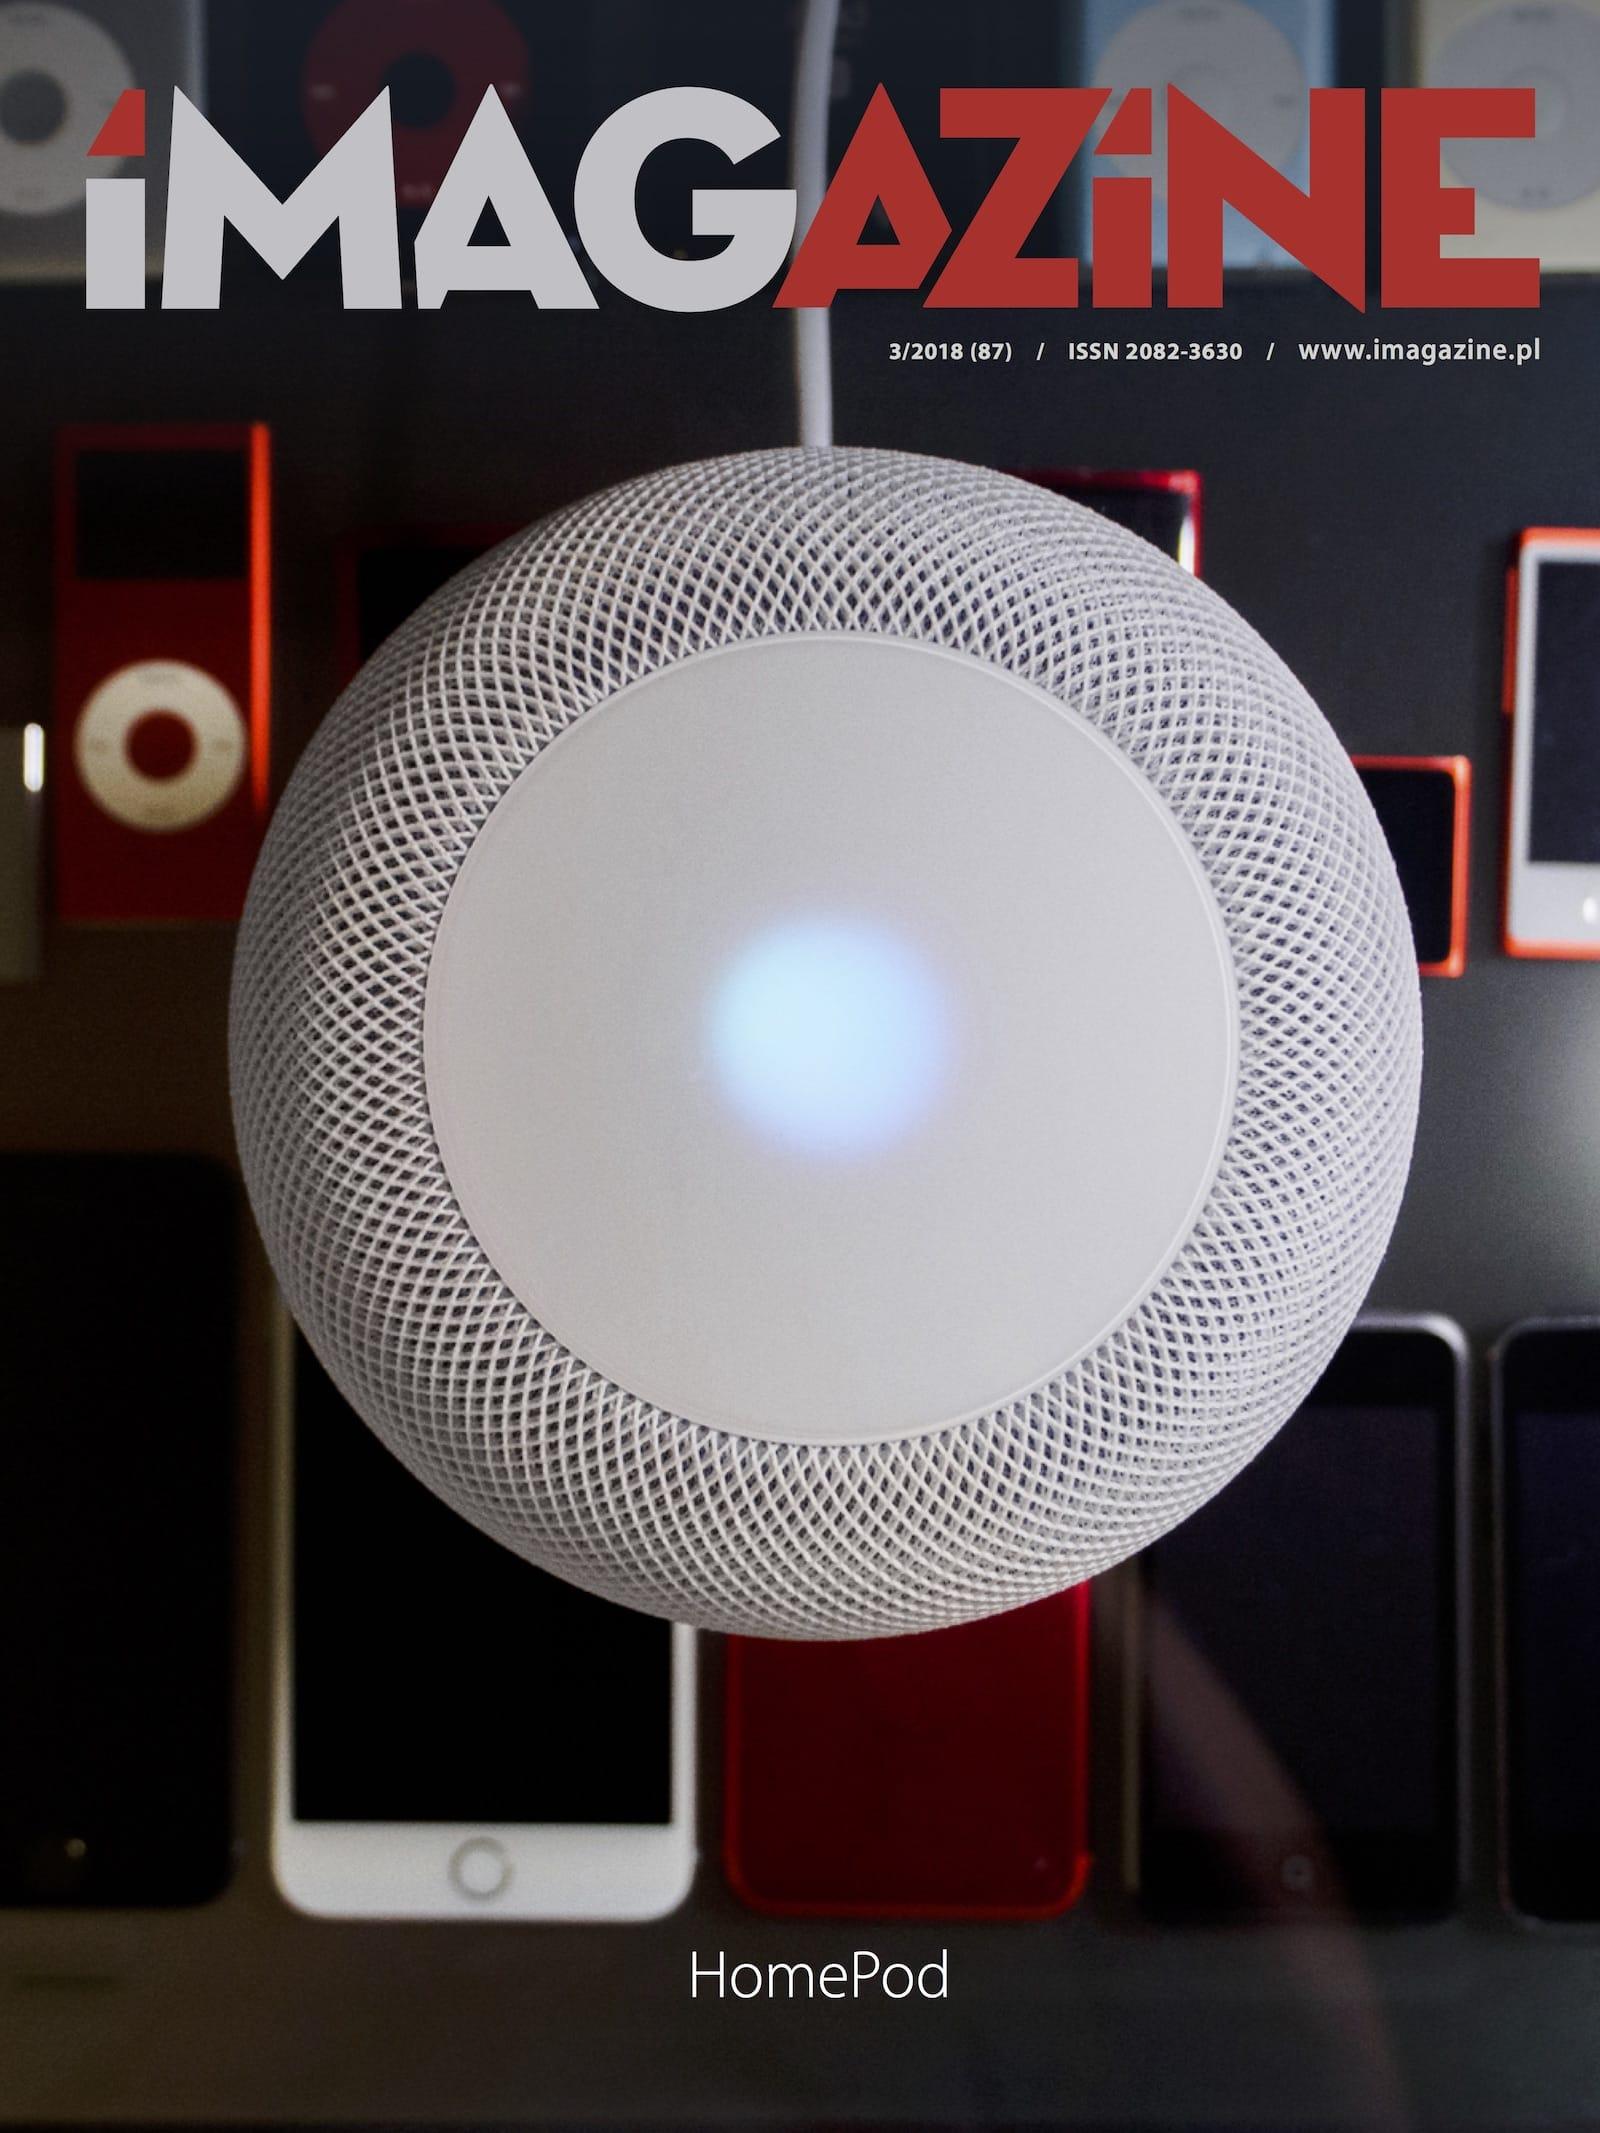 Okładka iMagazine 2018